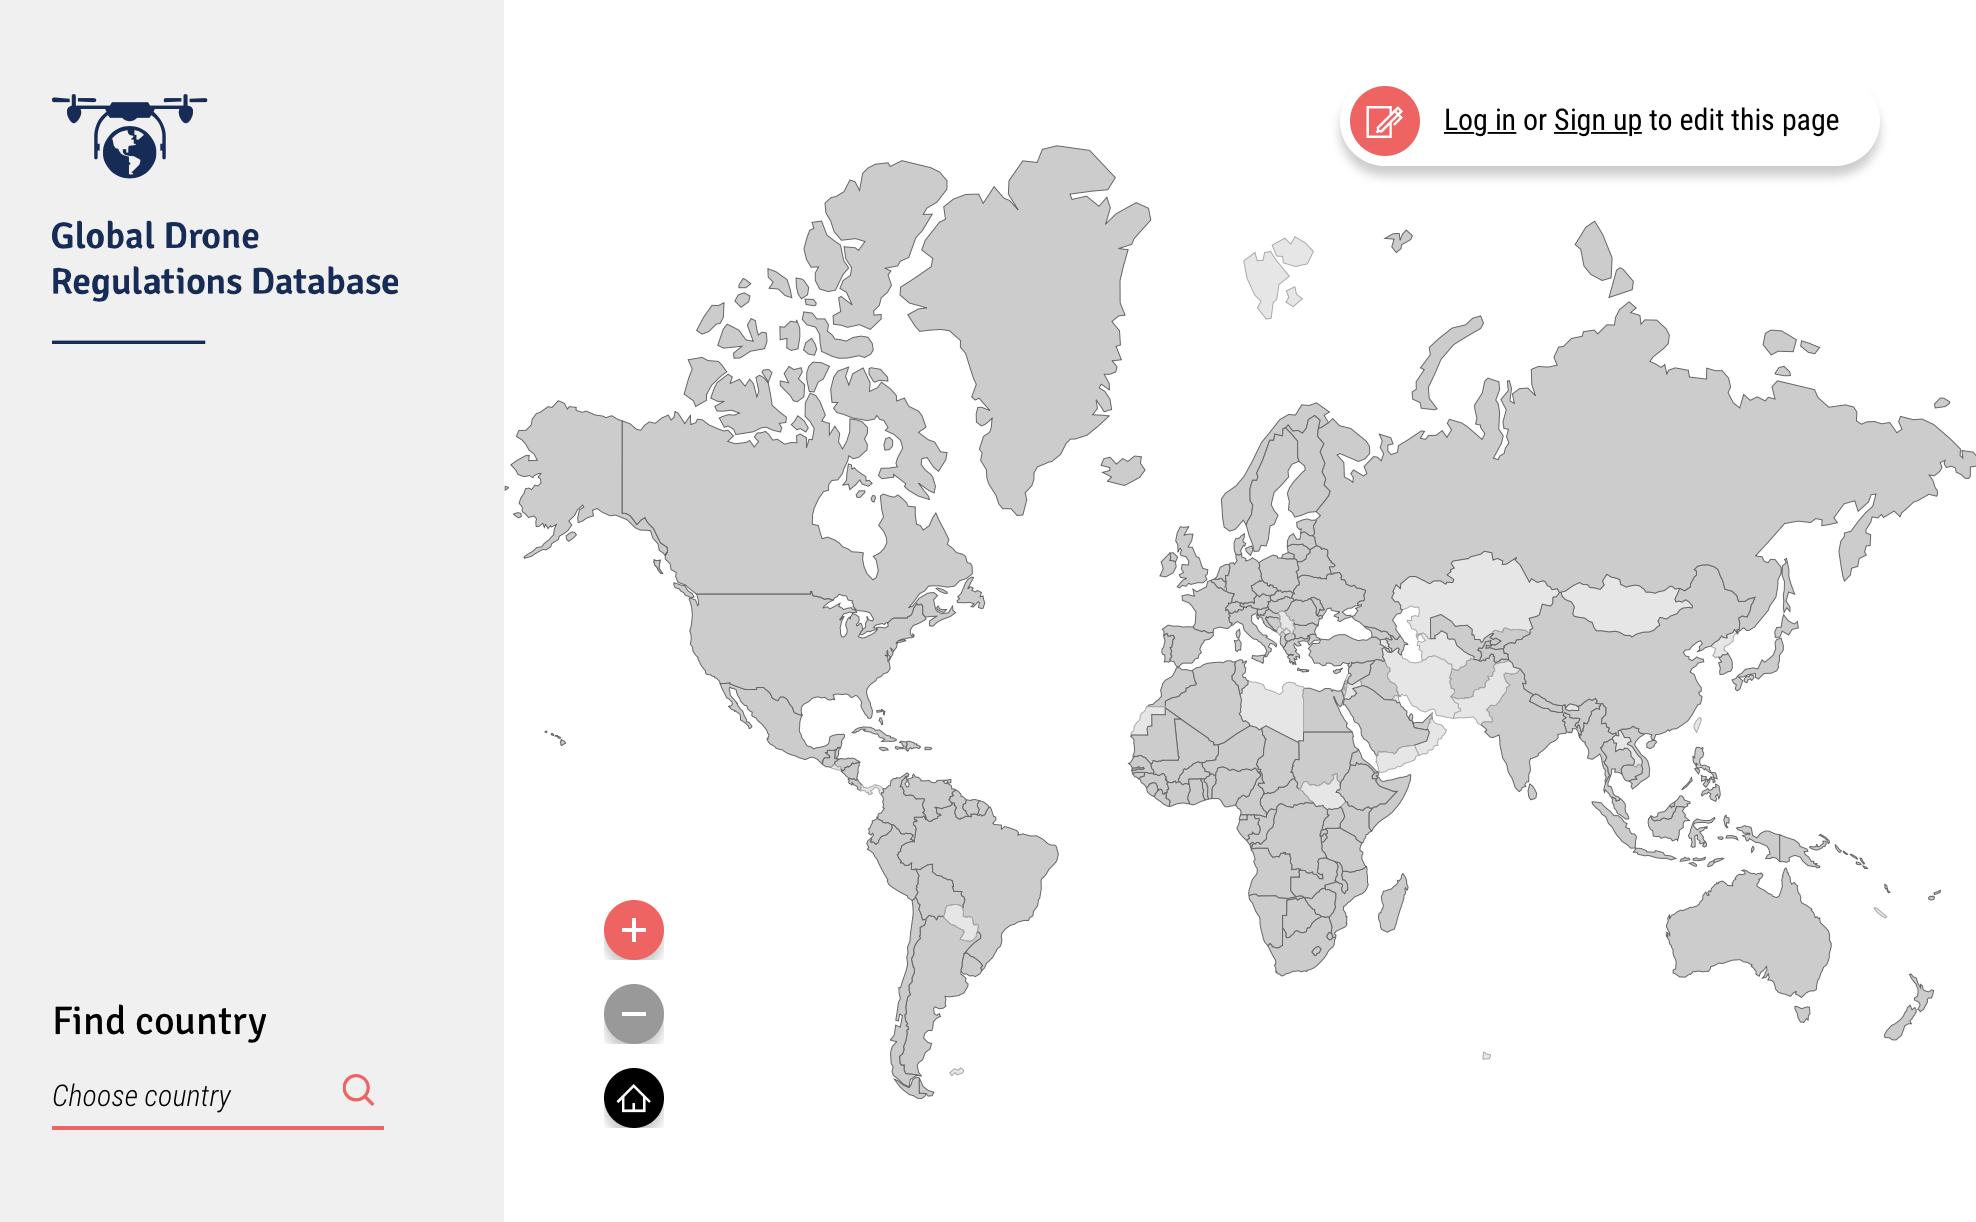 dronszabalyozas-vilagterkep-globaldroneregulationdatabase.png